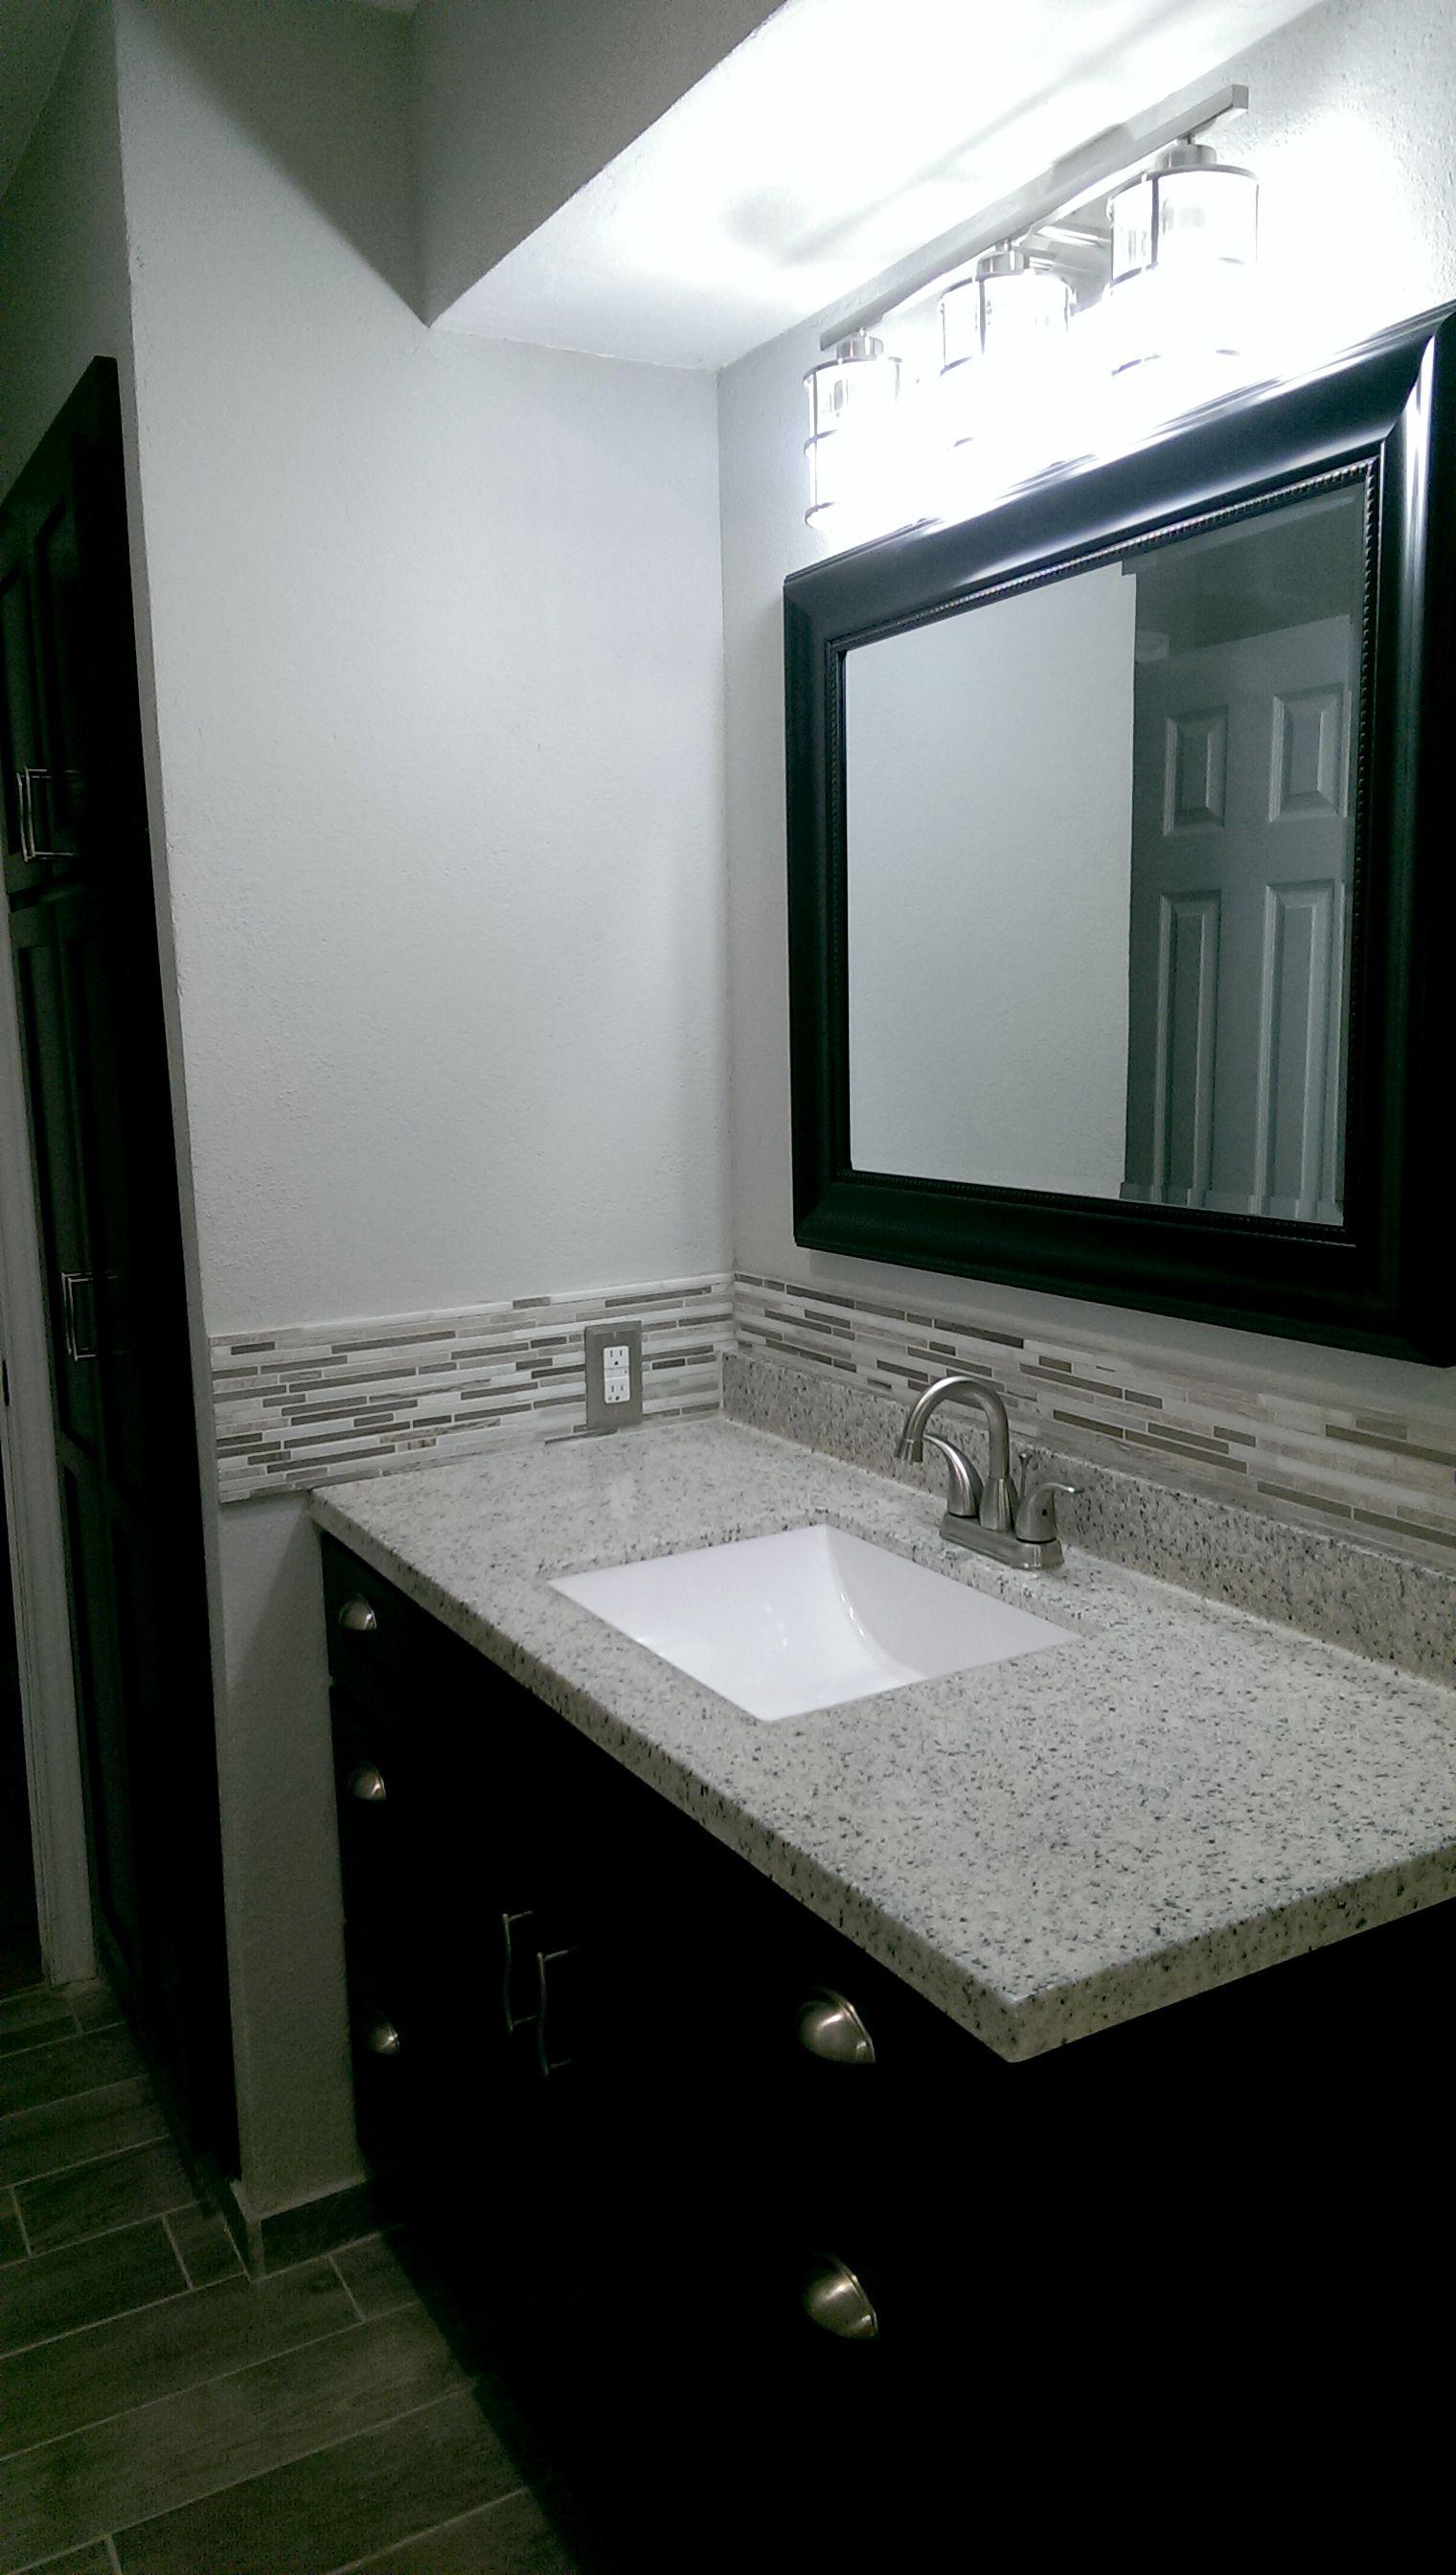 Bathroom Remodel By Dana M Mesquite Tx We Did A